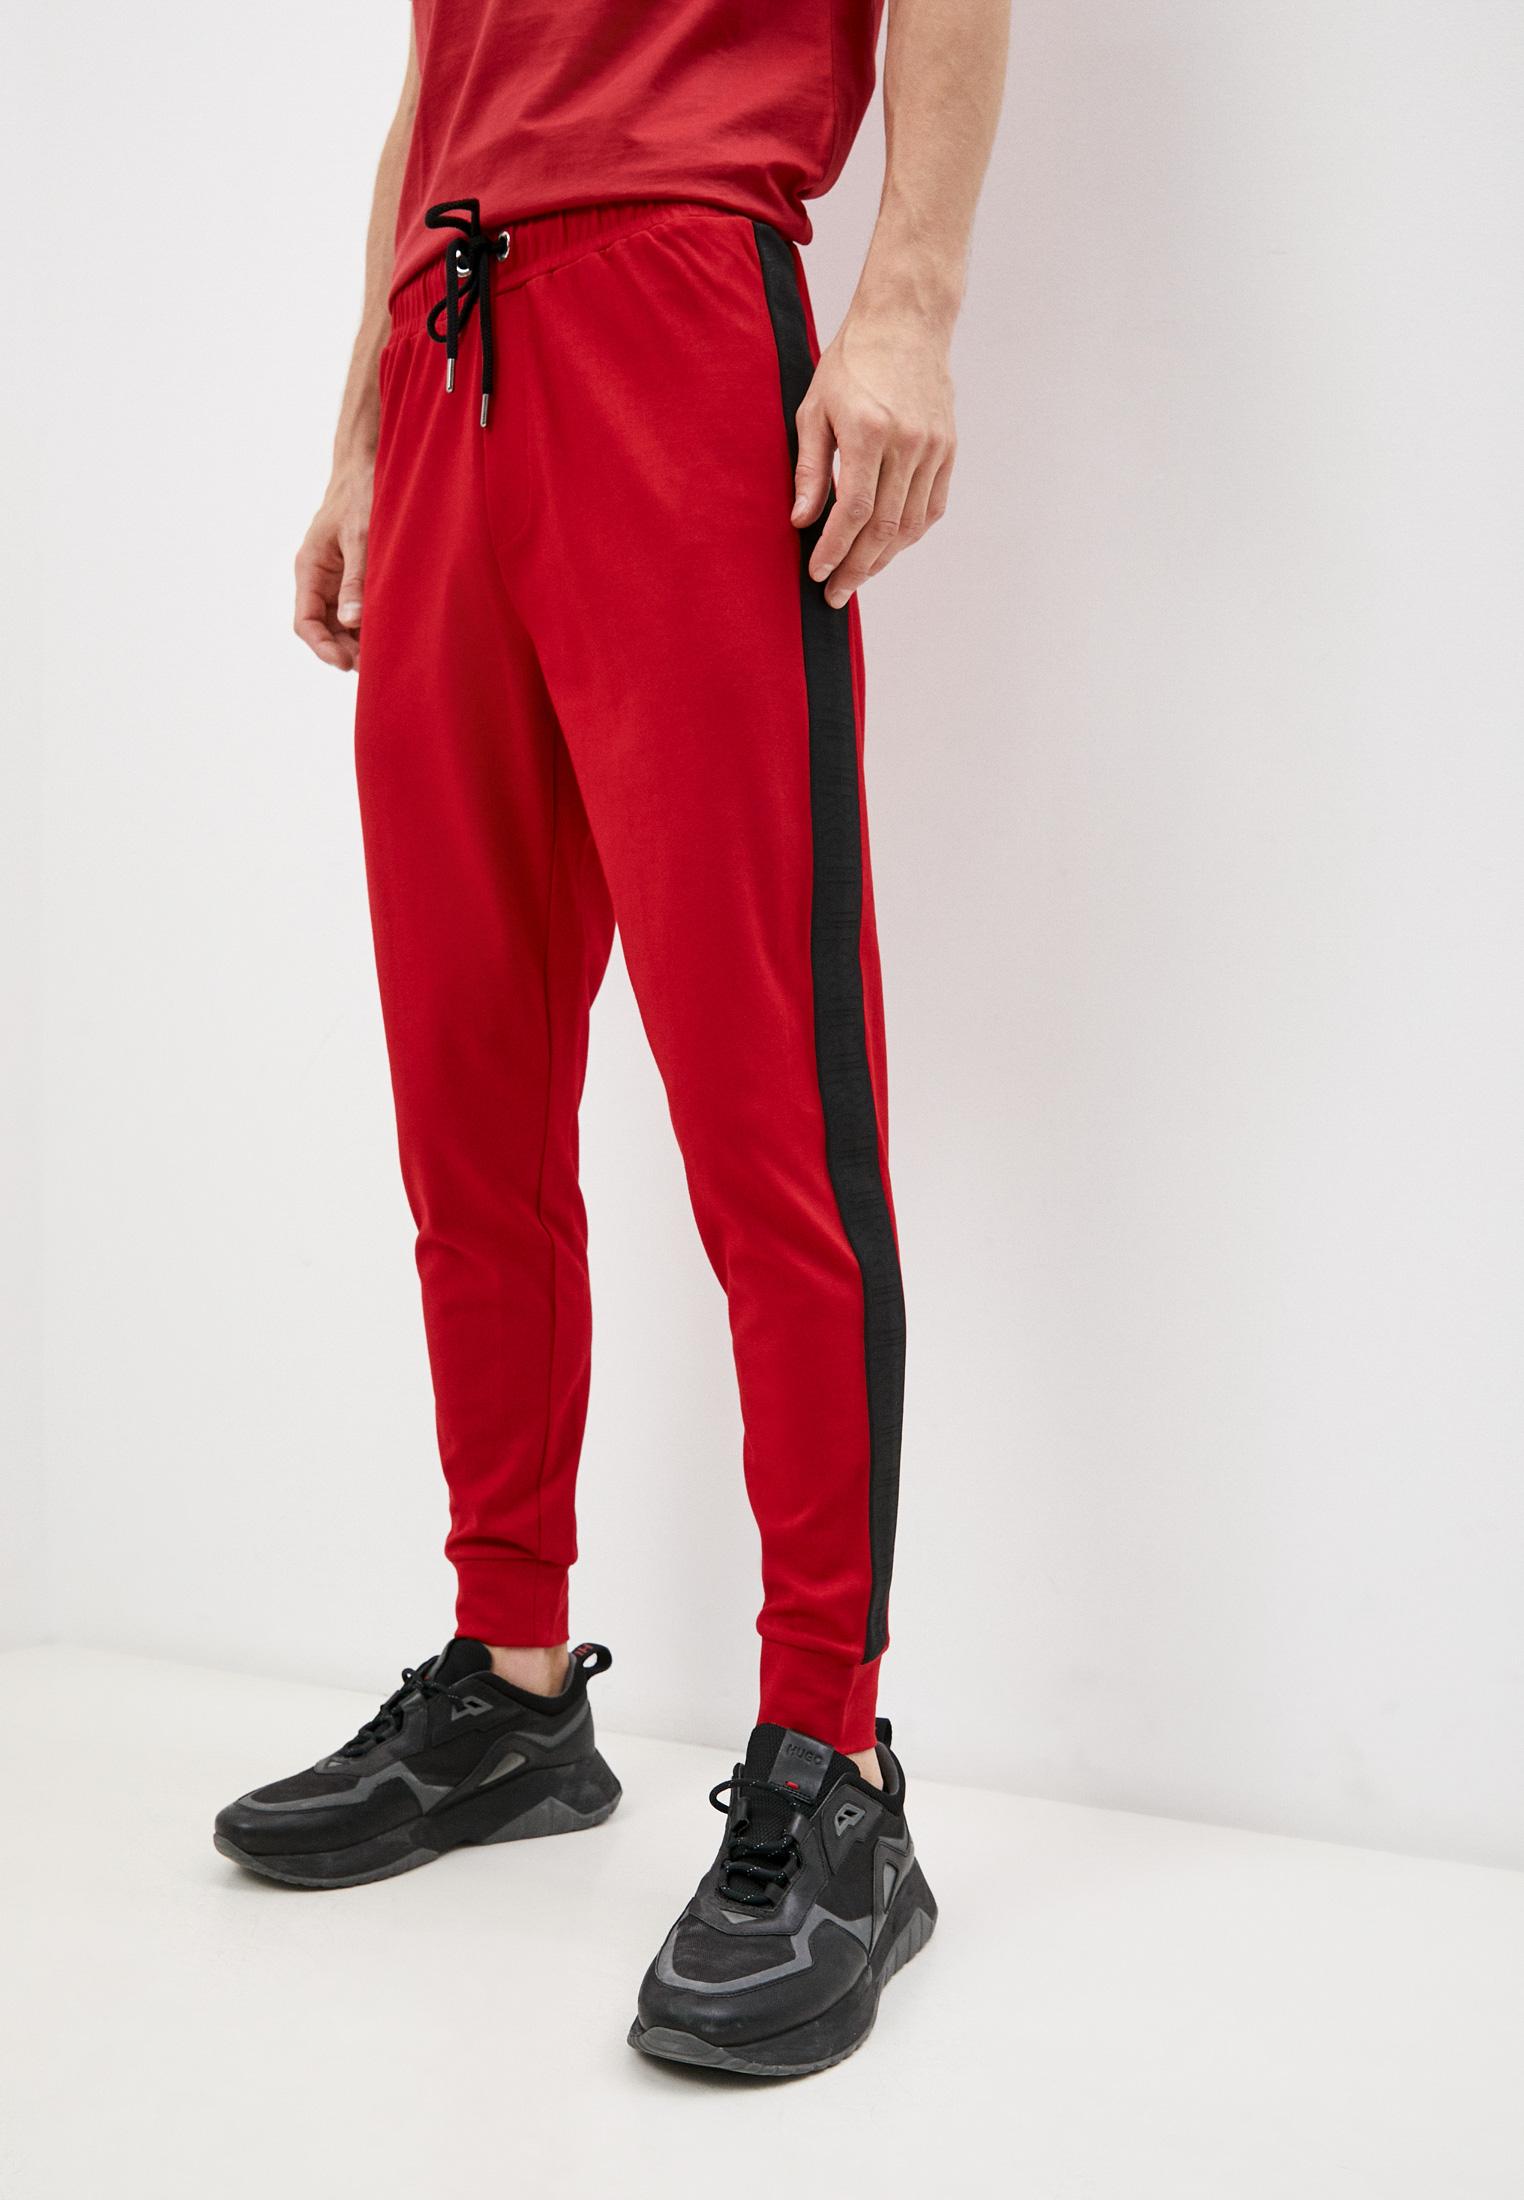 Мужские спортивные брюки John Richmond (Джон Ричмонд) RMA20222PA